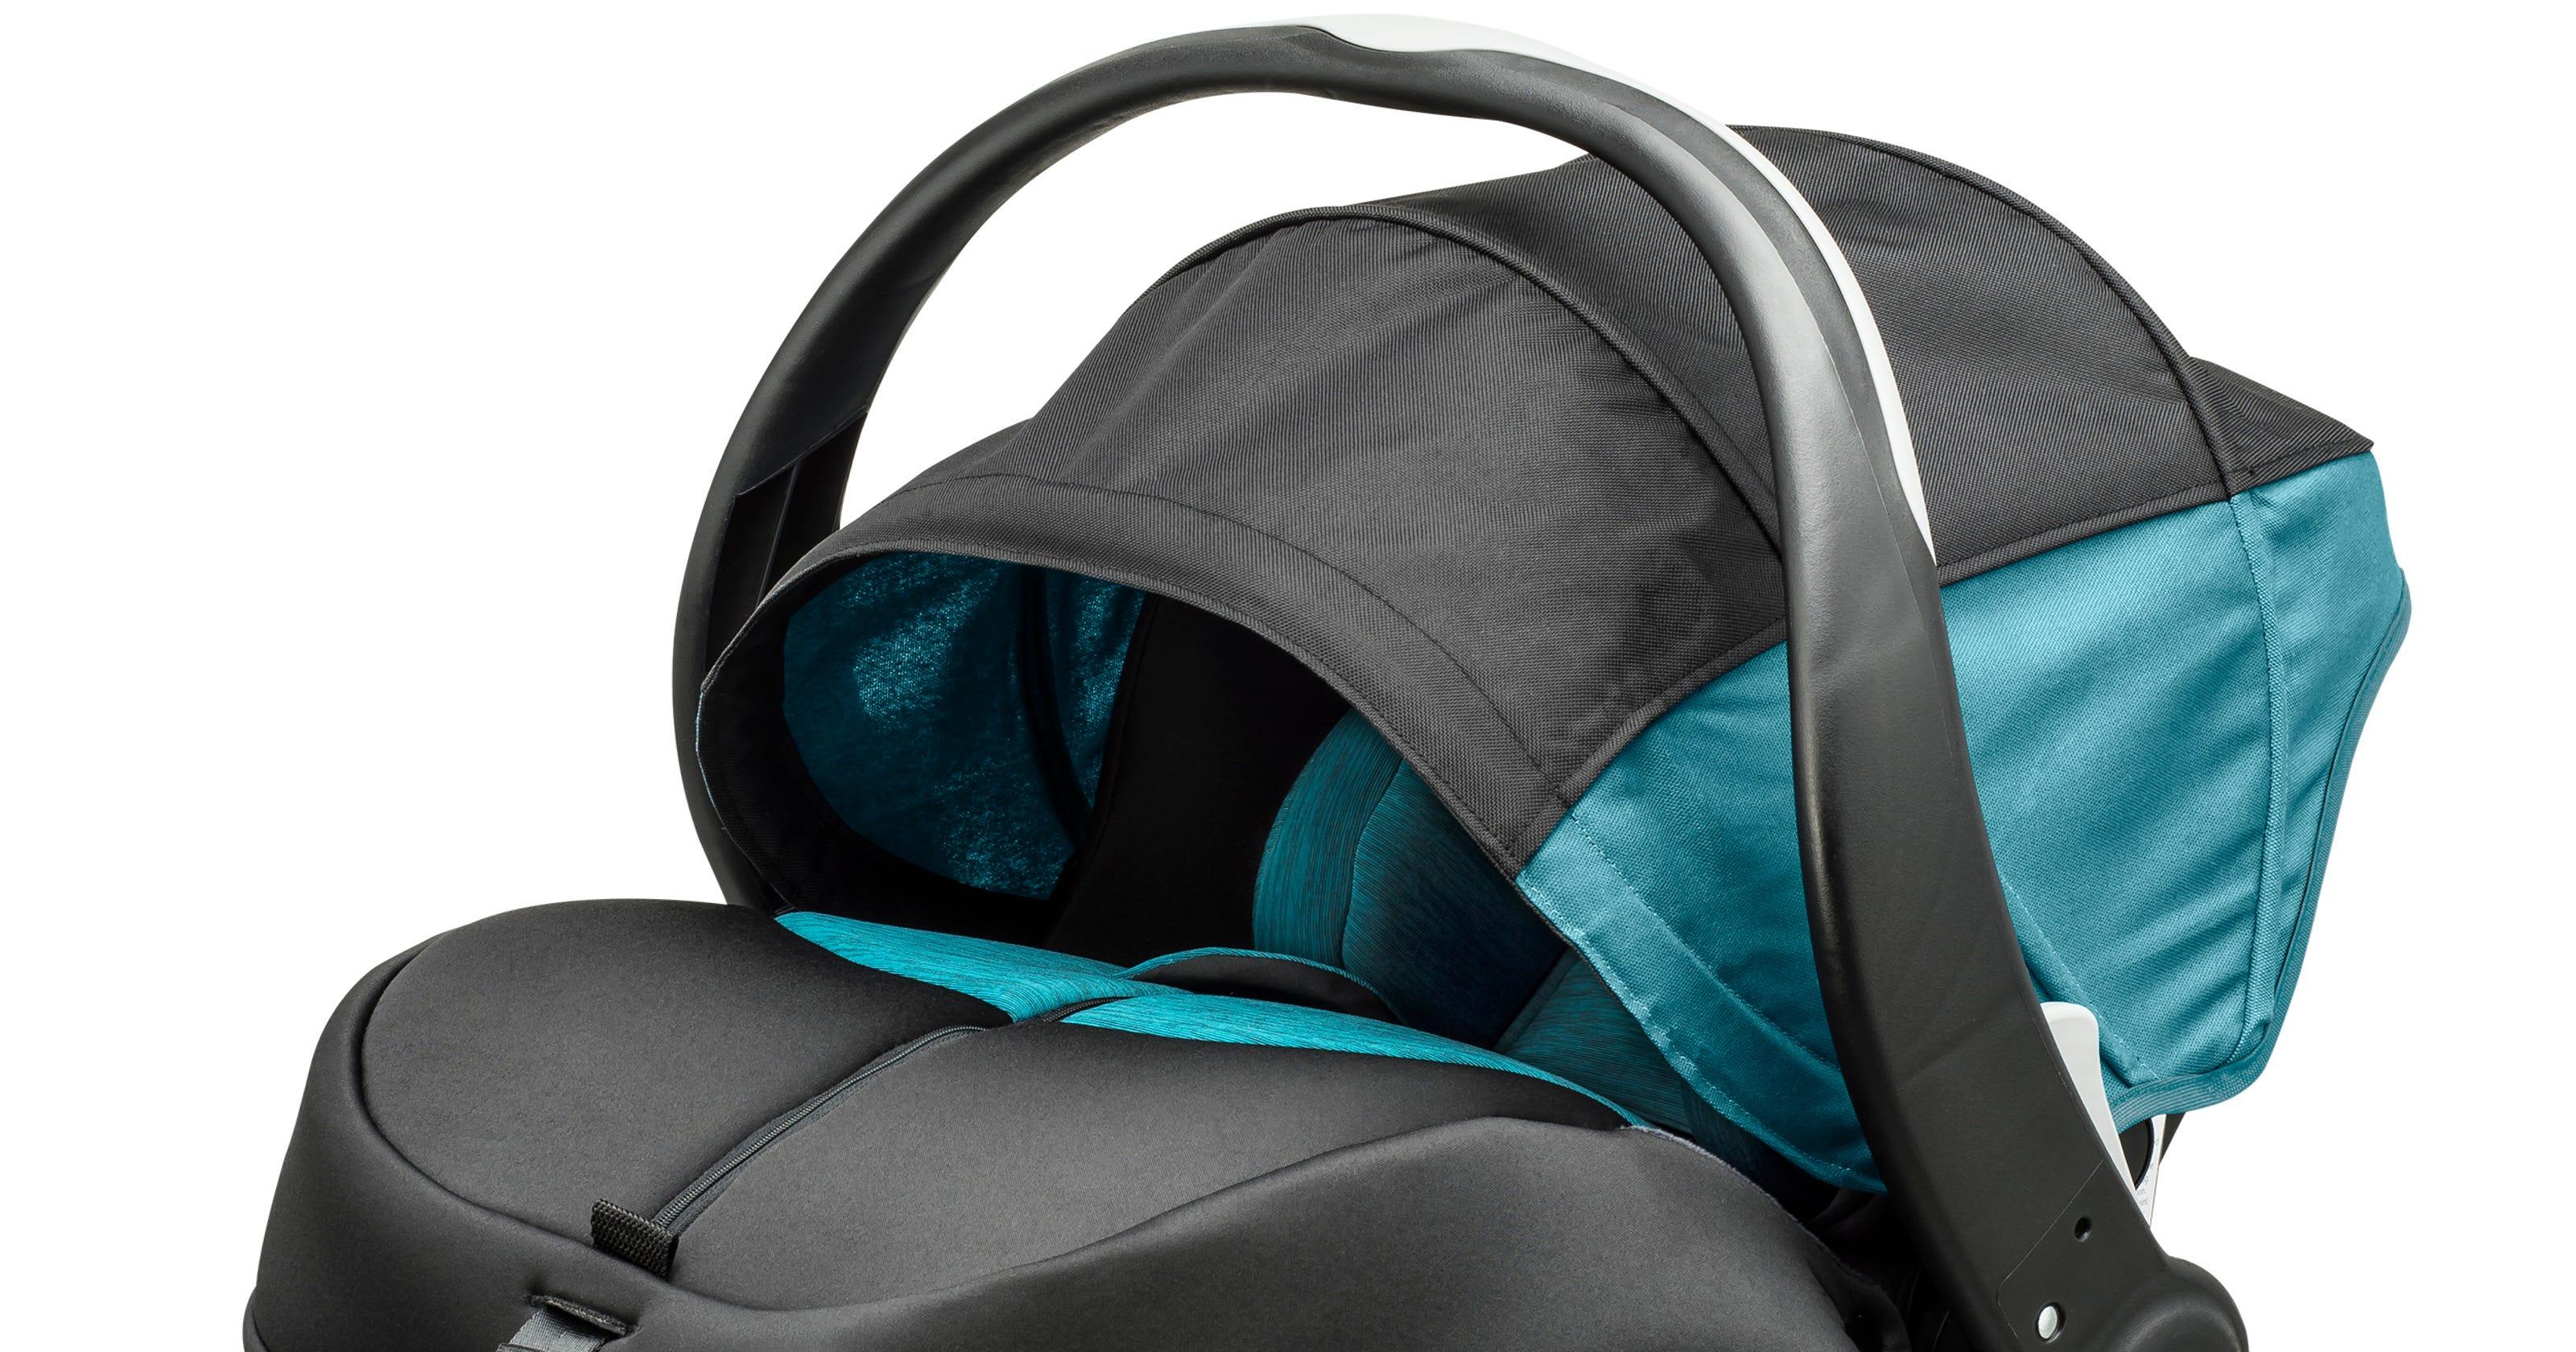 SensorSafe Child Car Seat Helps Prevent Heatstroke Death